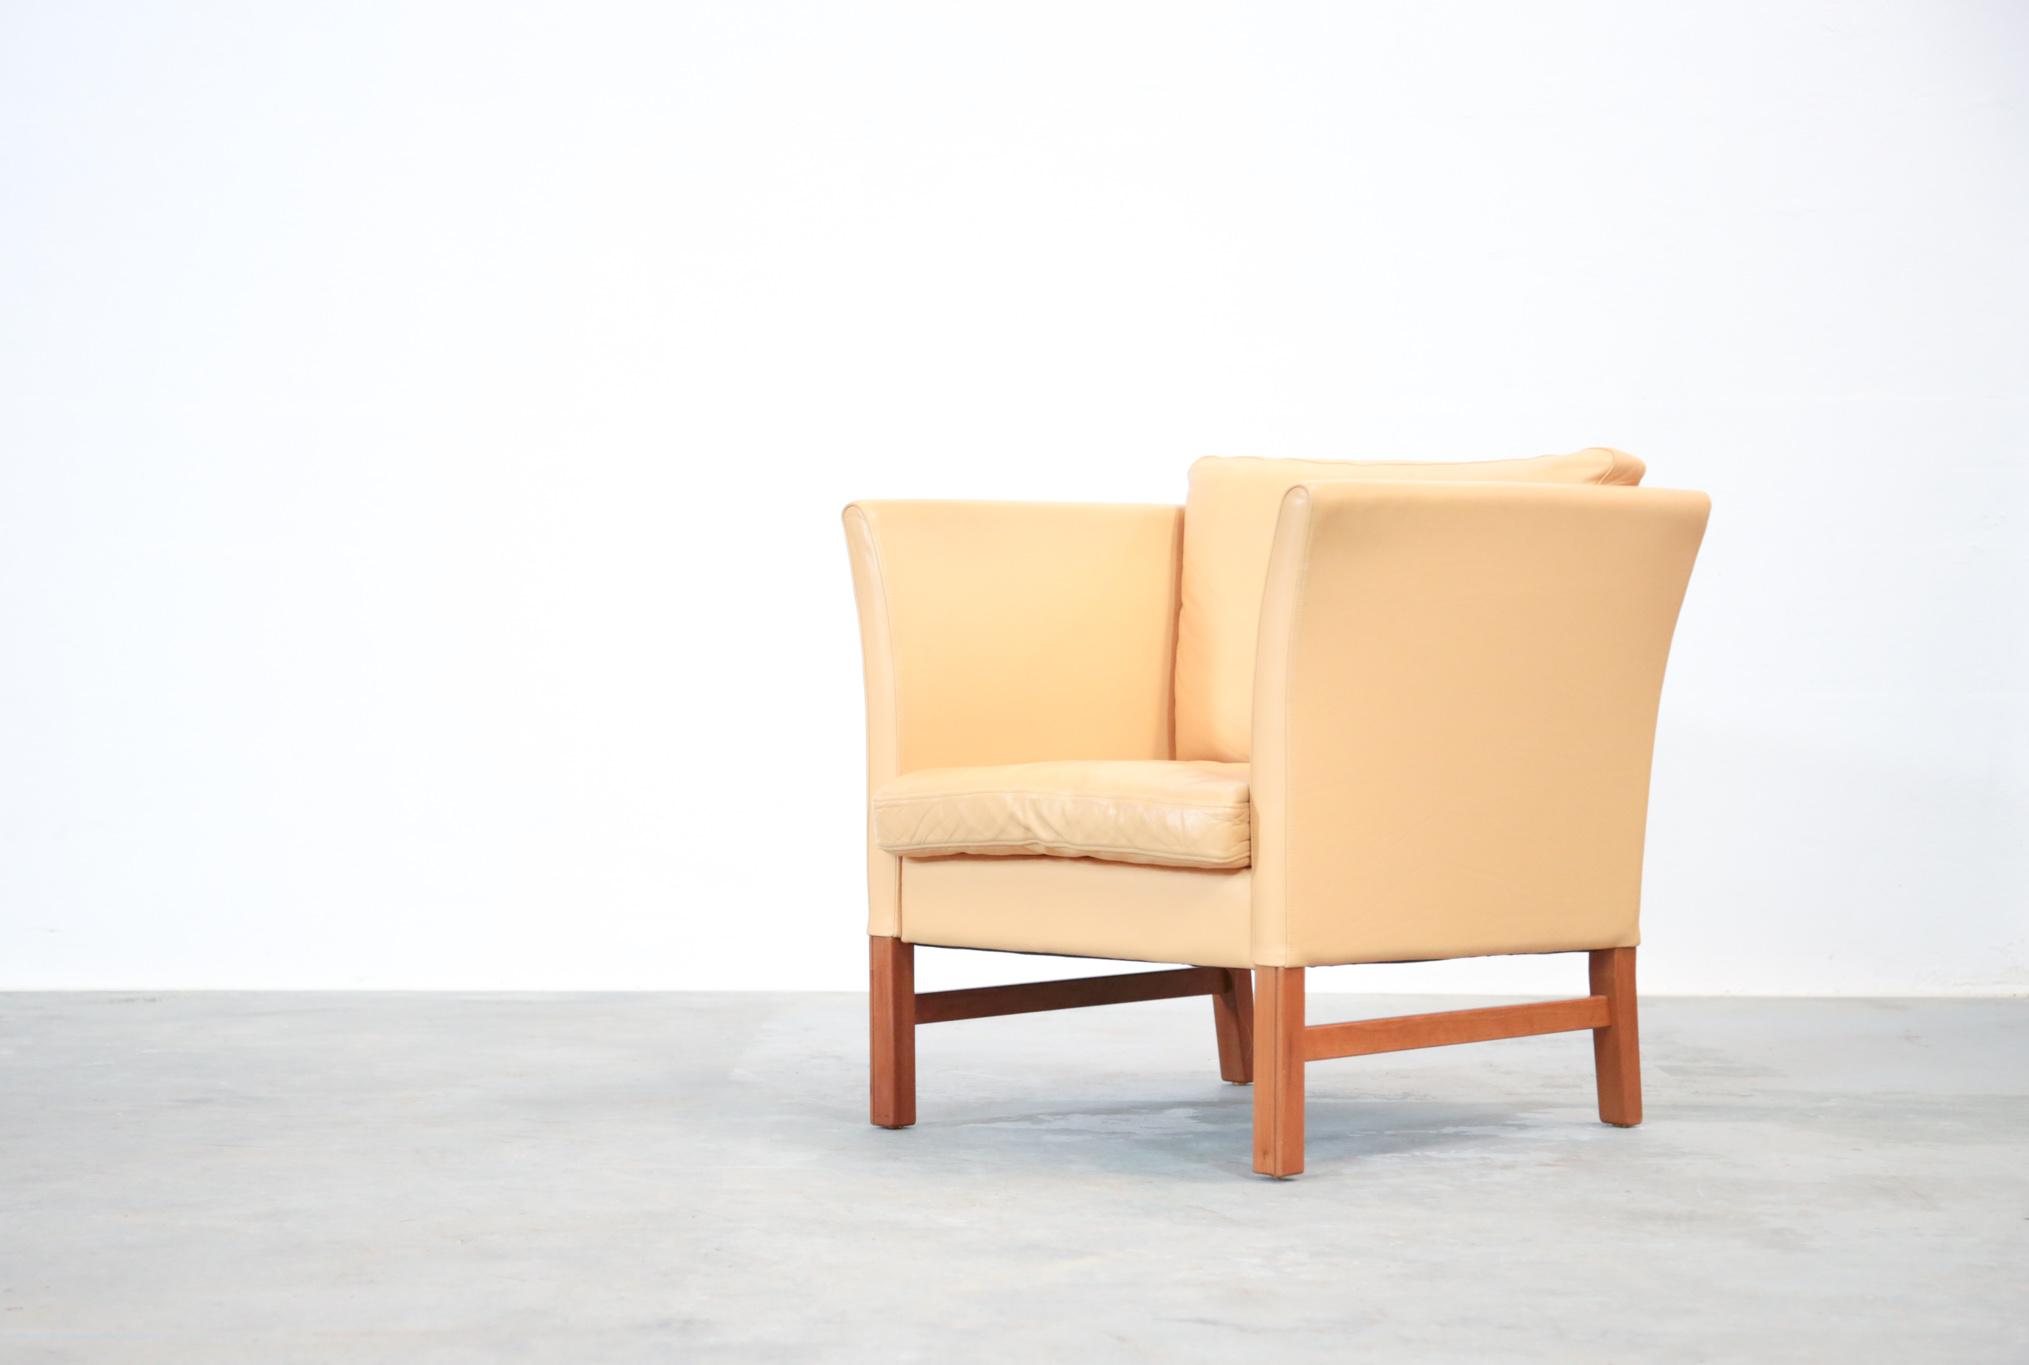 fauteuil danois en cuir beige danke galerie. Black Bedroom Furniture Sets. Home Design Ideas